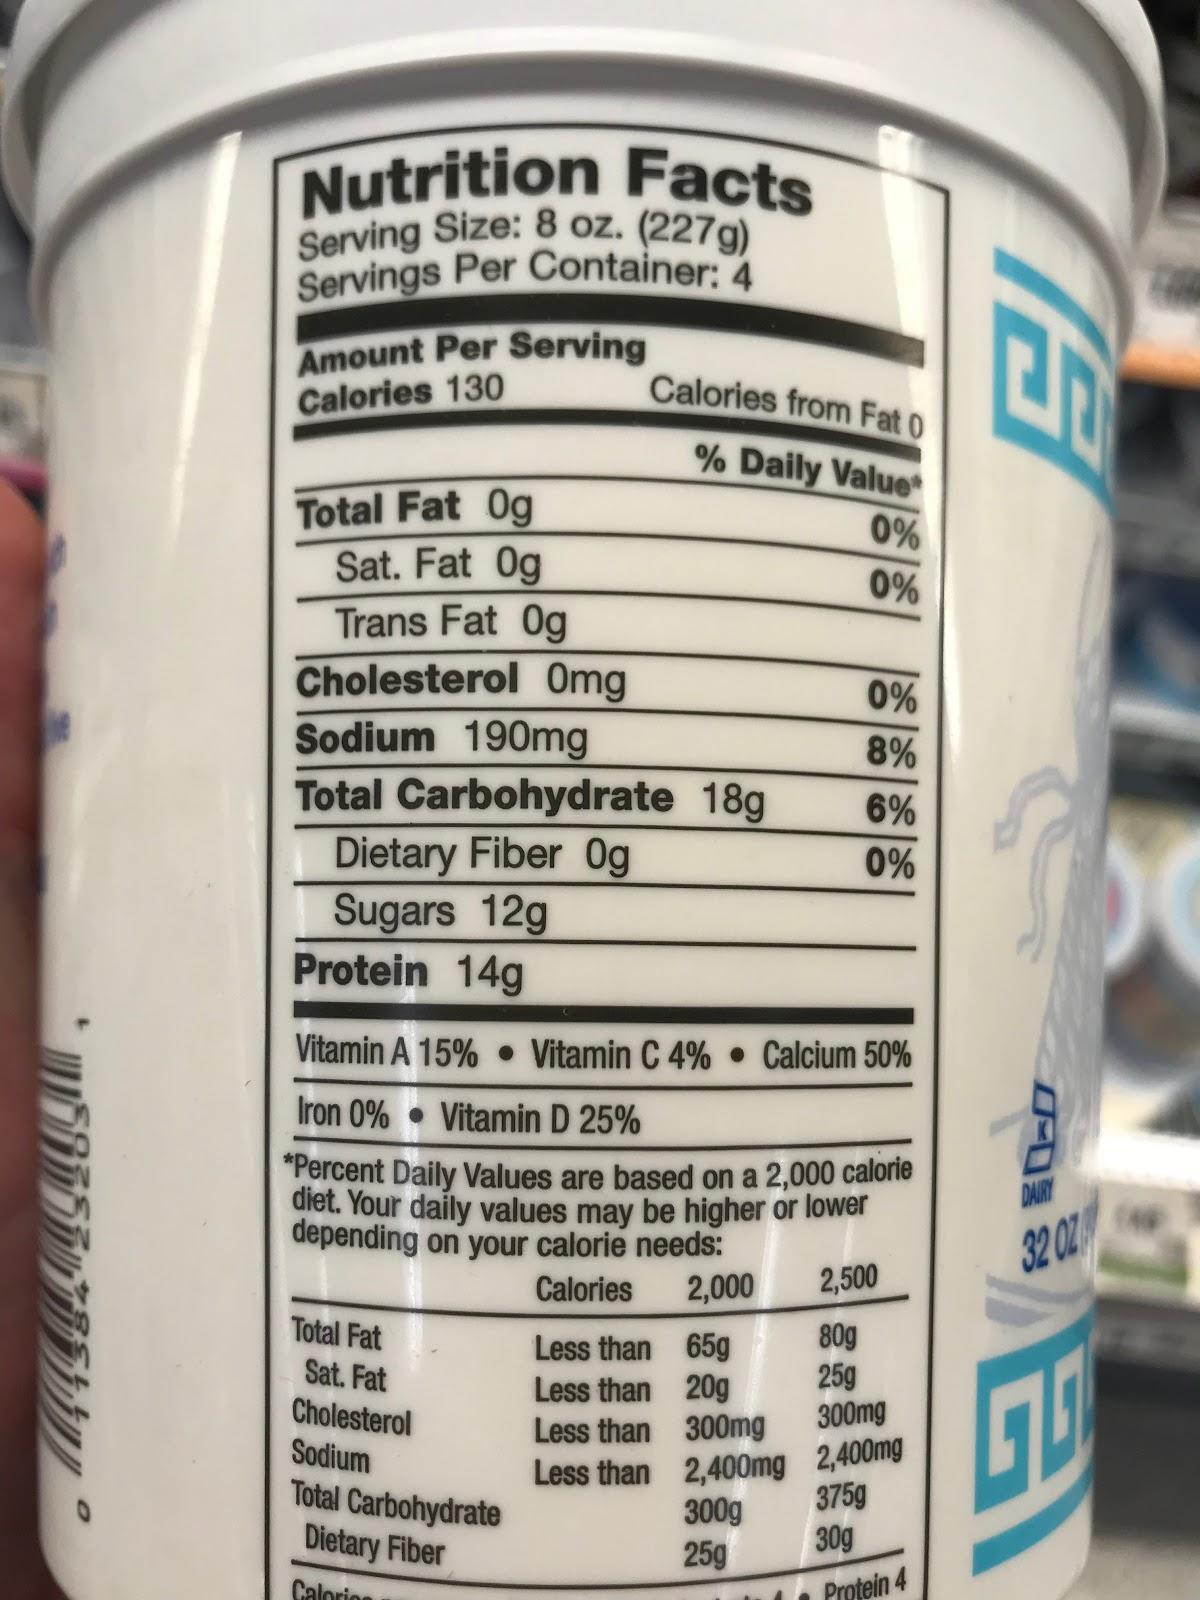 image of nutrition facts for plain Greek yogurt showing 12g of sugar